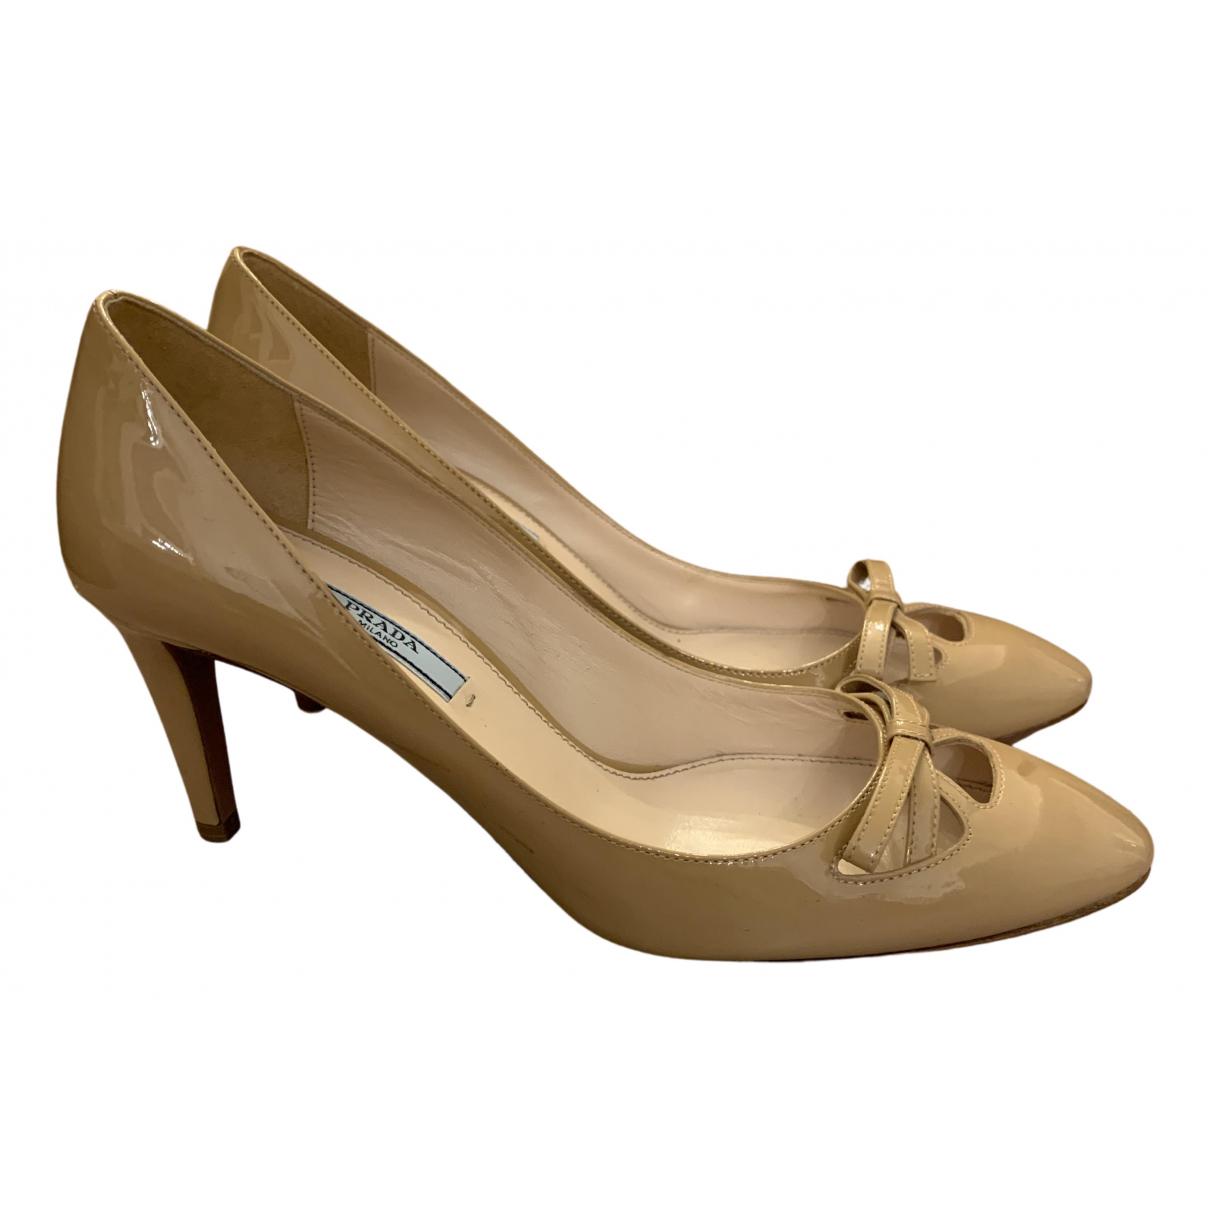 Prada N Beige Patent leather Heels for Women 38.5 EU